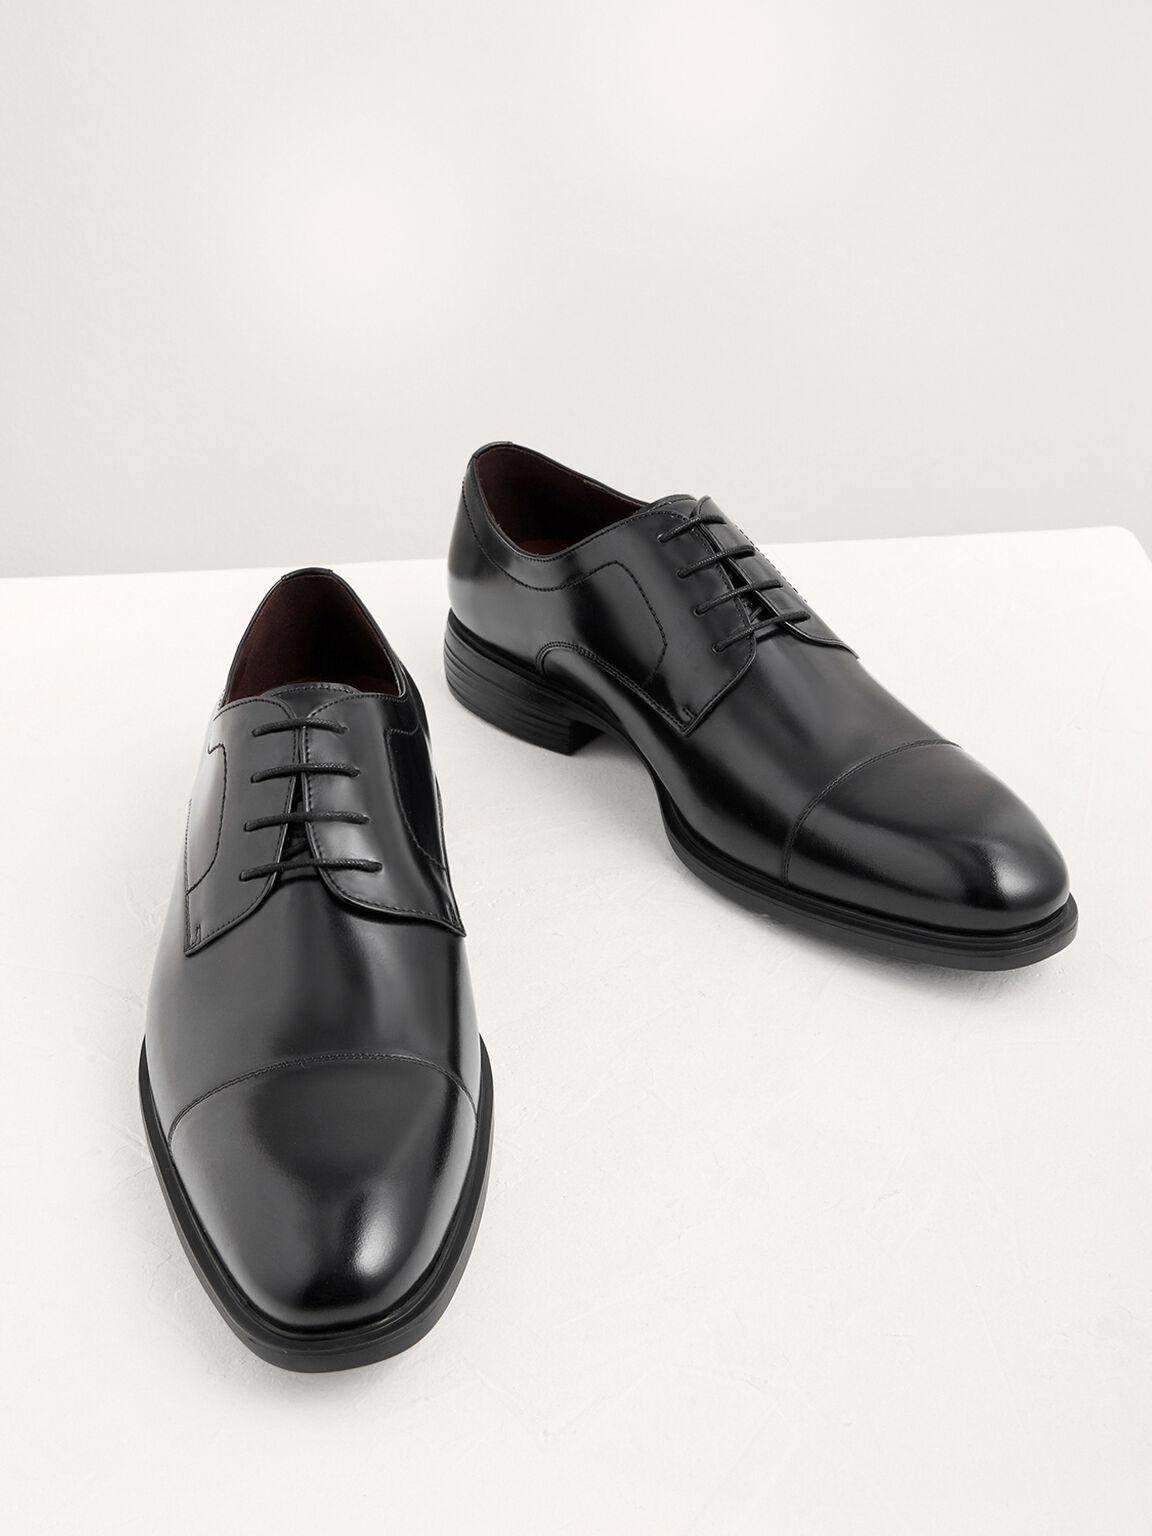 Lightweight Leather Cap Toe Derby Shoes, Black, hi-res